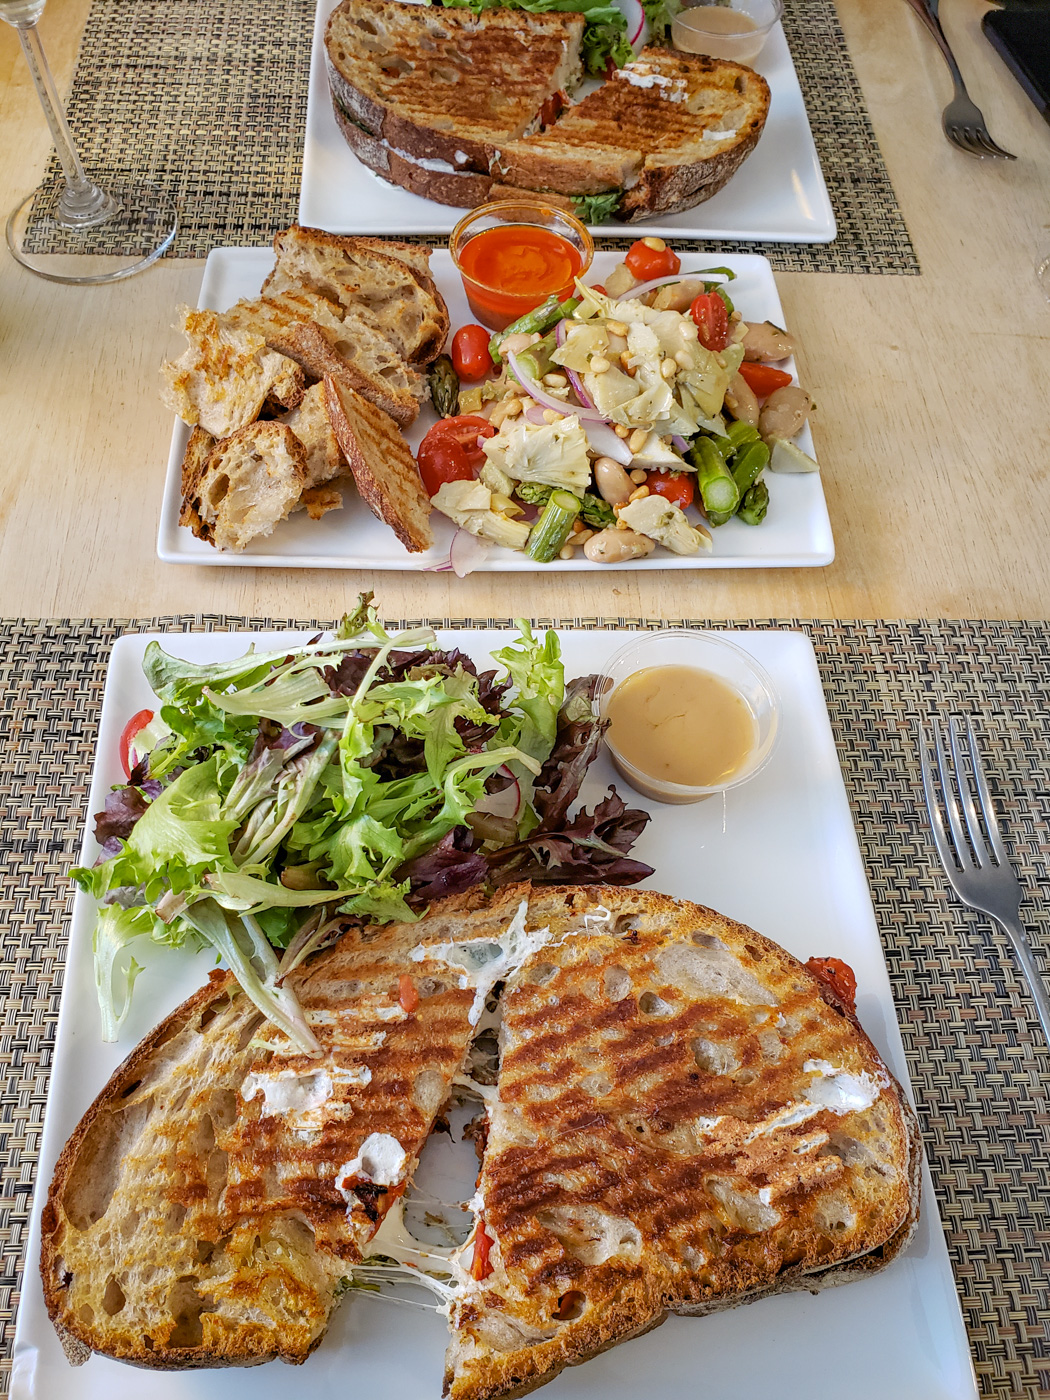 Claudio Mozzarella Panino and Artichoke and Asparagus Salad